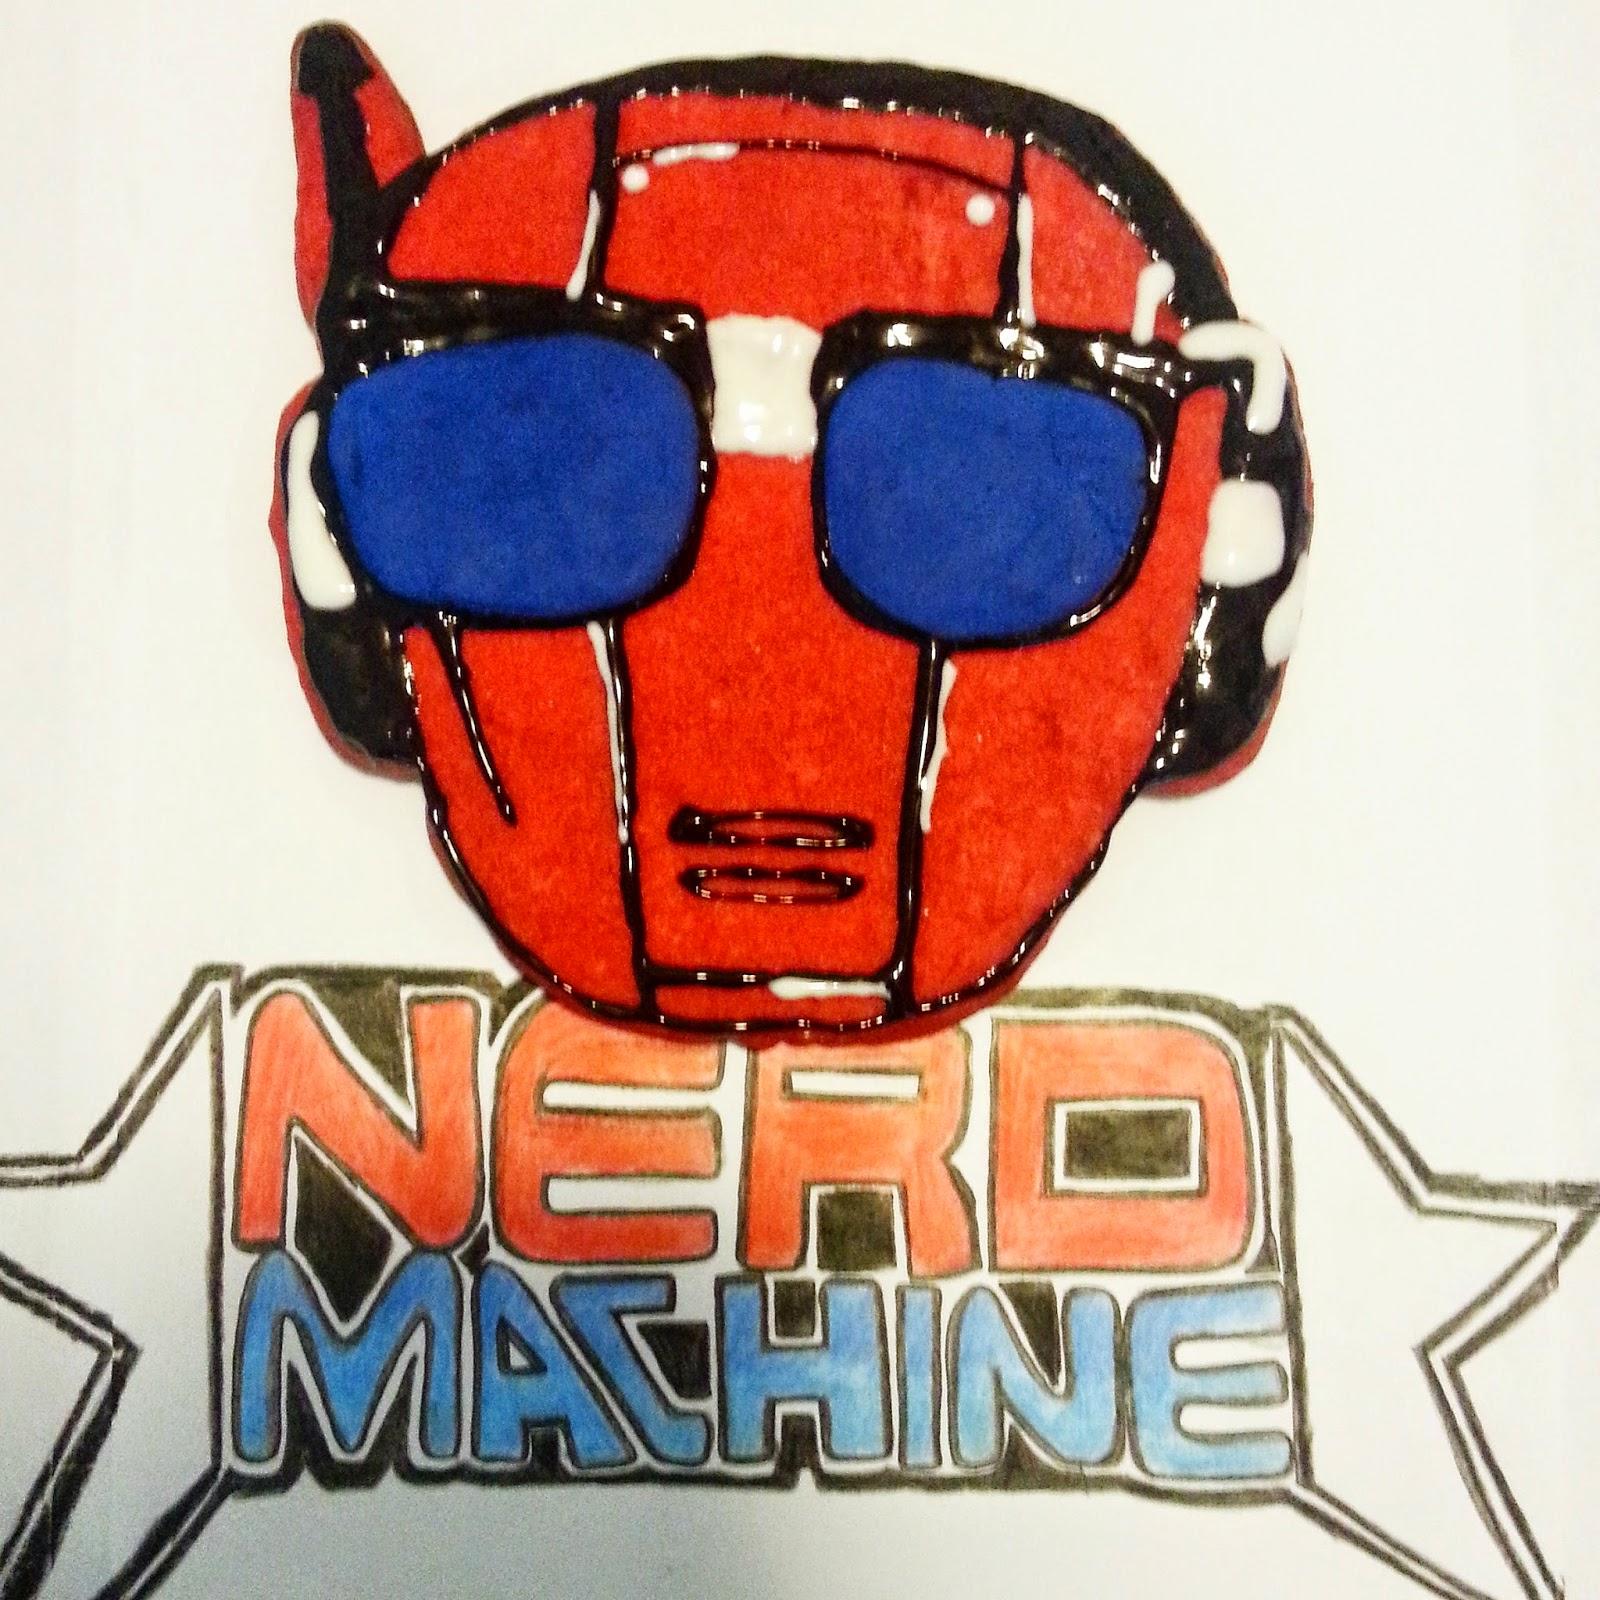 nerd machine, nerd hq, chuck, cookies, baking